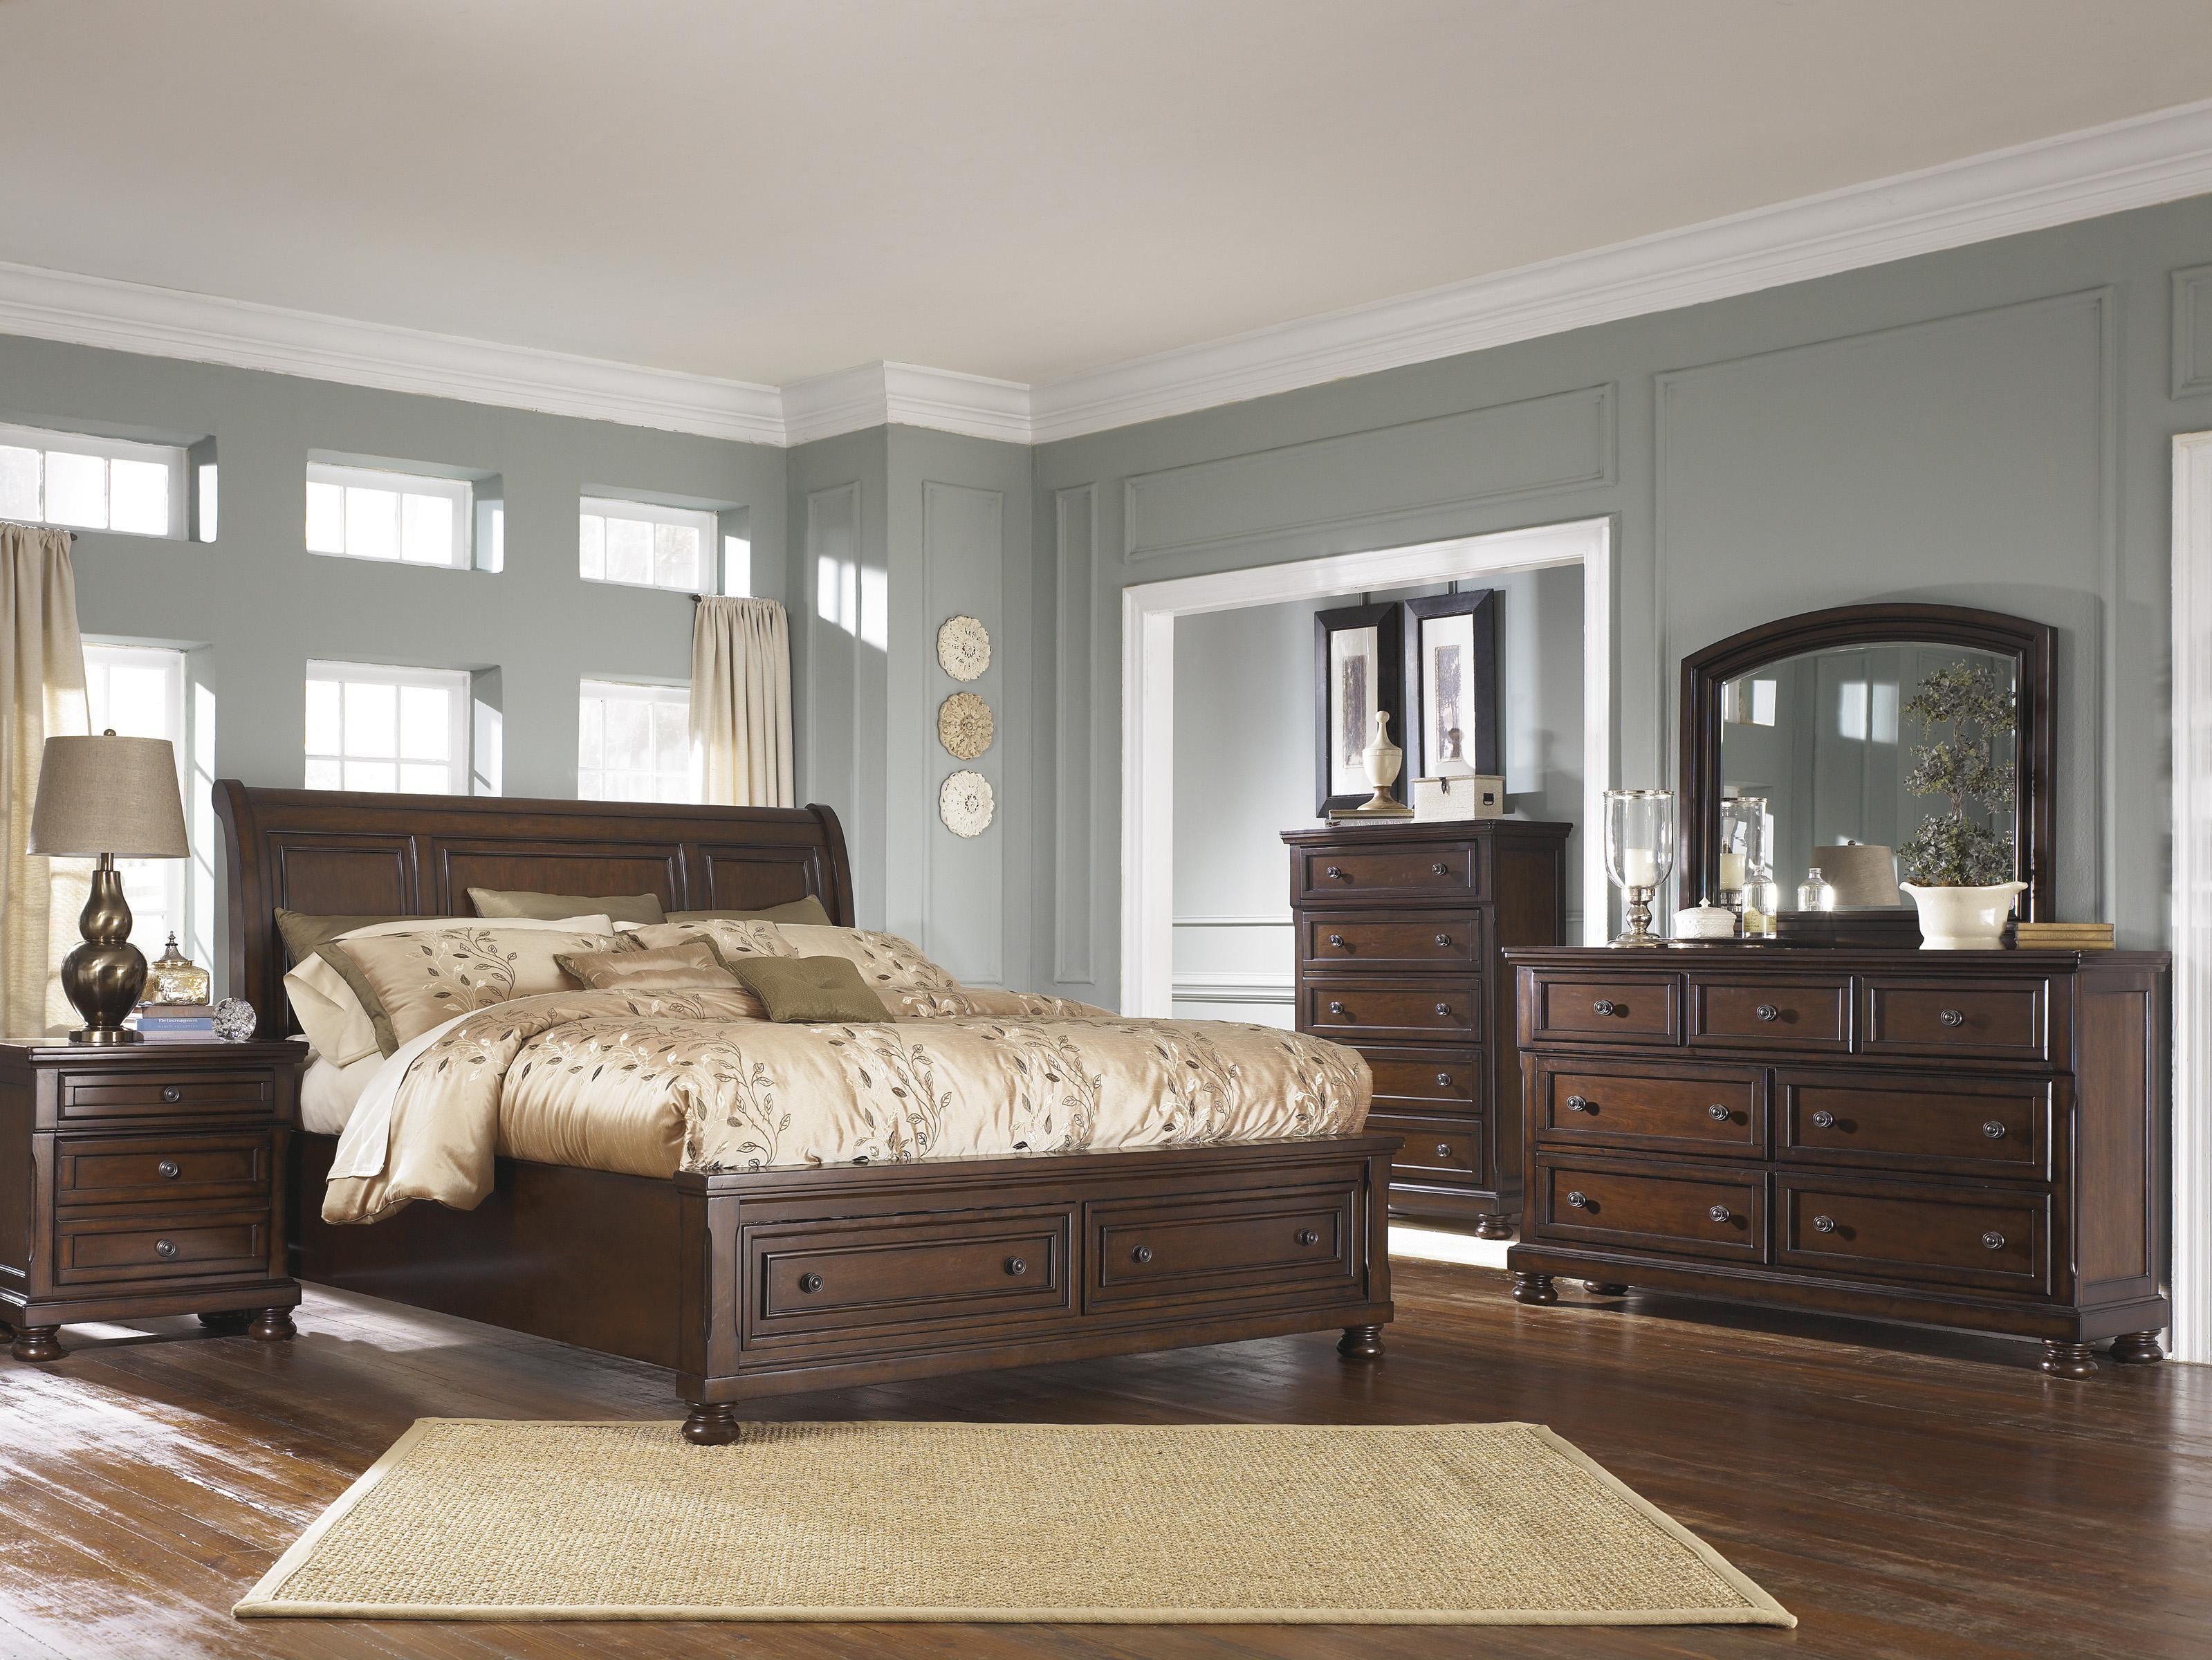 Marlo Furniture Bedroom Sets Enchanting Porter House King Bedroom Groupashley Furniture  Furniture Review